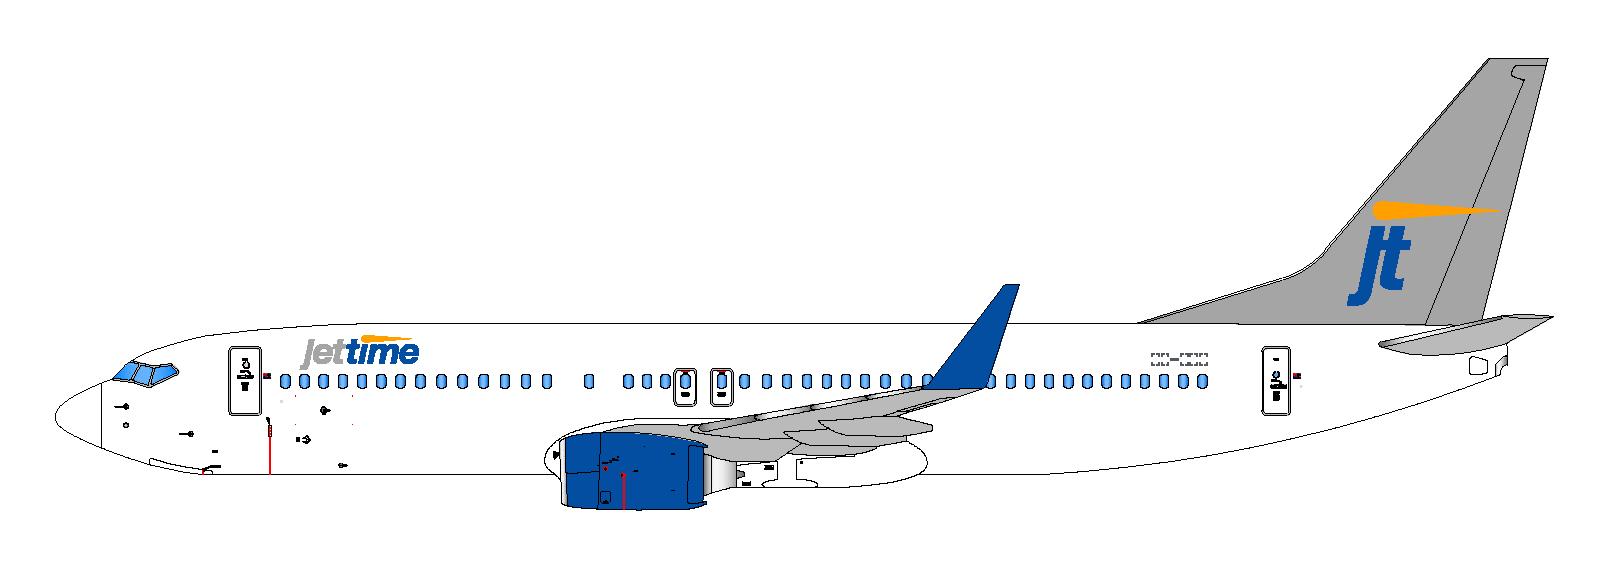 Boeing 737-800 tegning